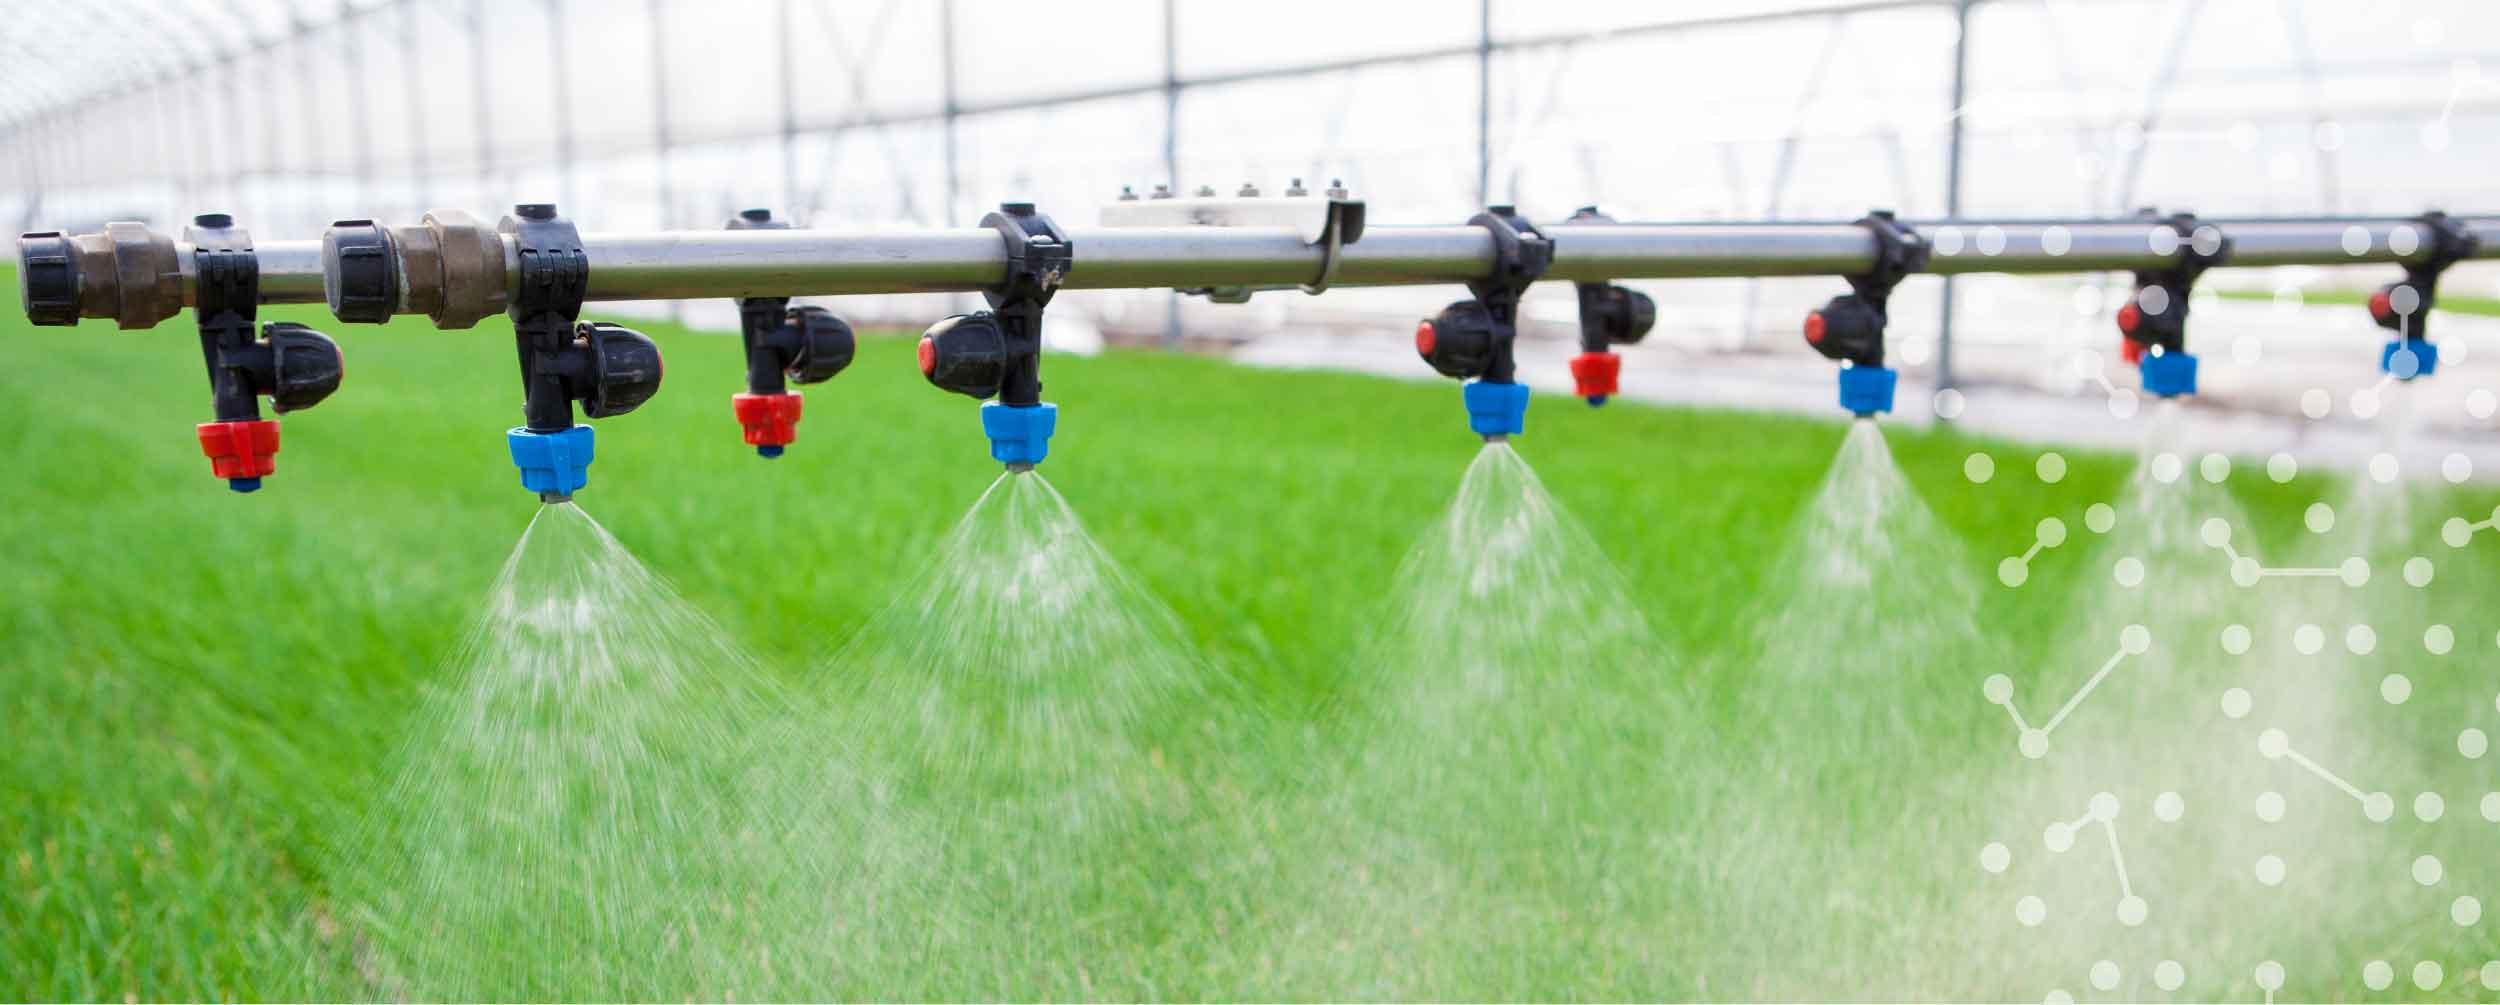 Irrigation and Fertigation Automation — Autogrow